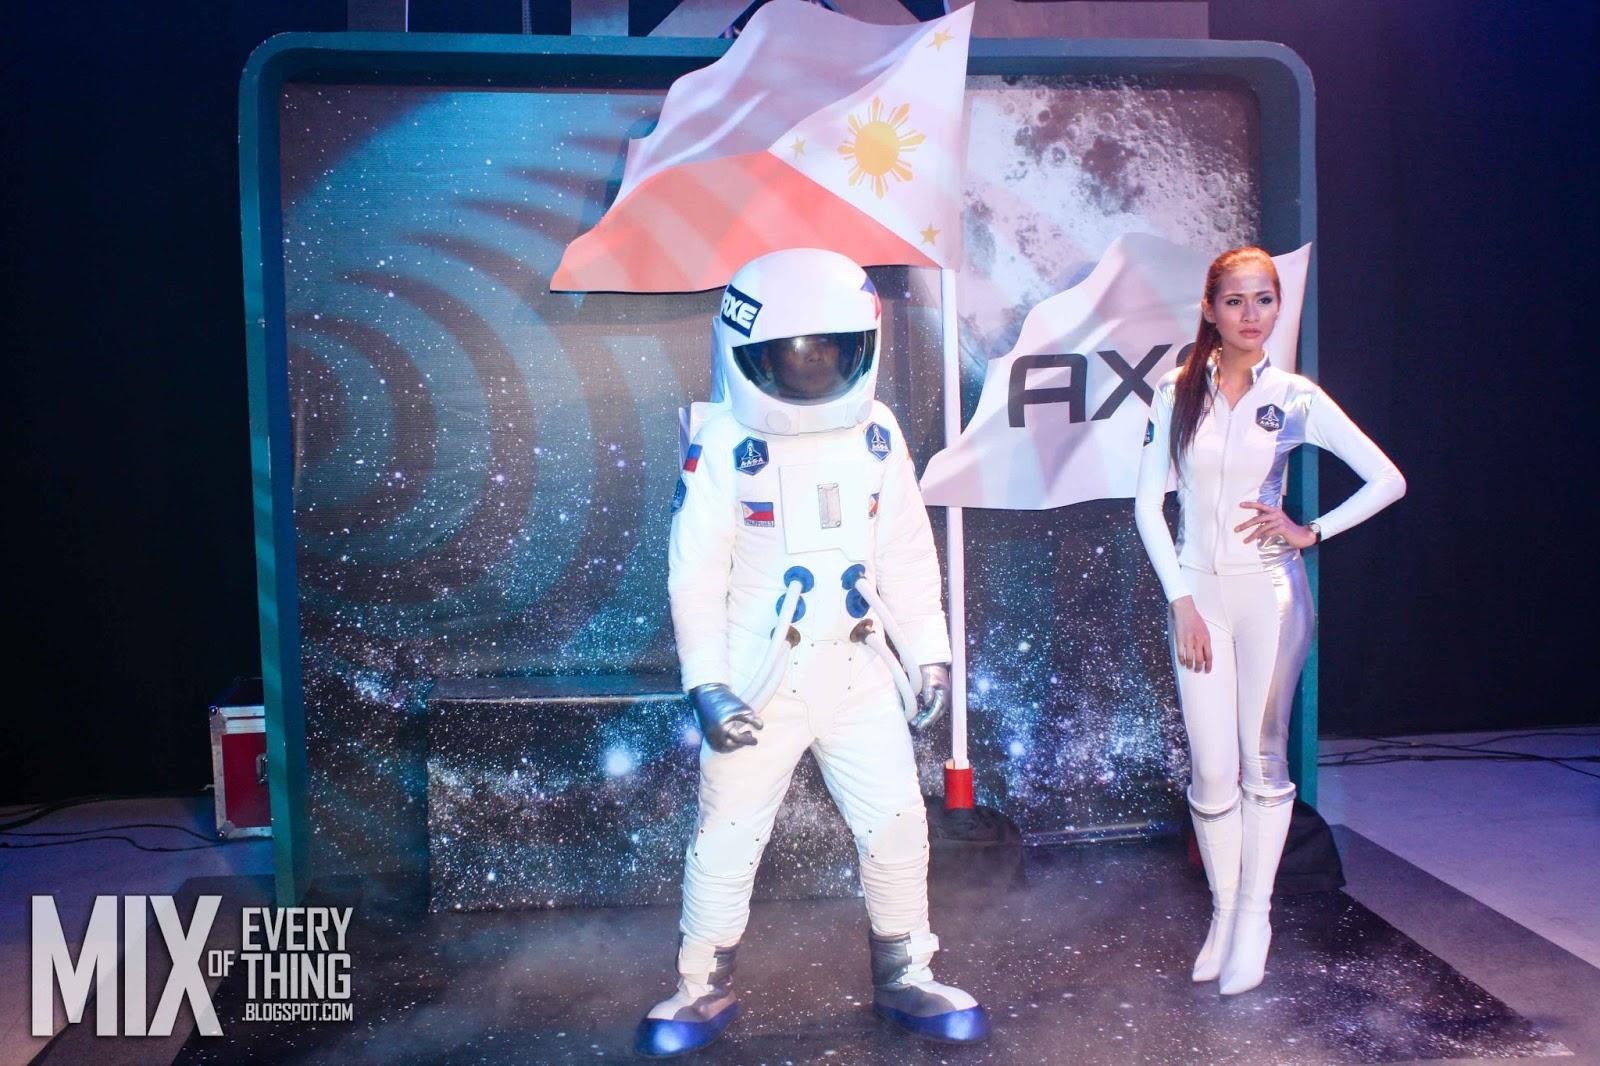 axe apollo space academy winner list - photo #40